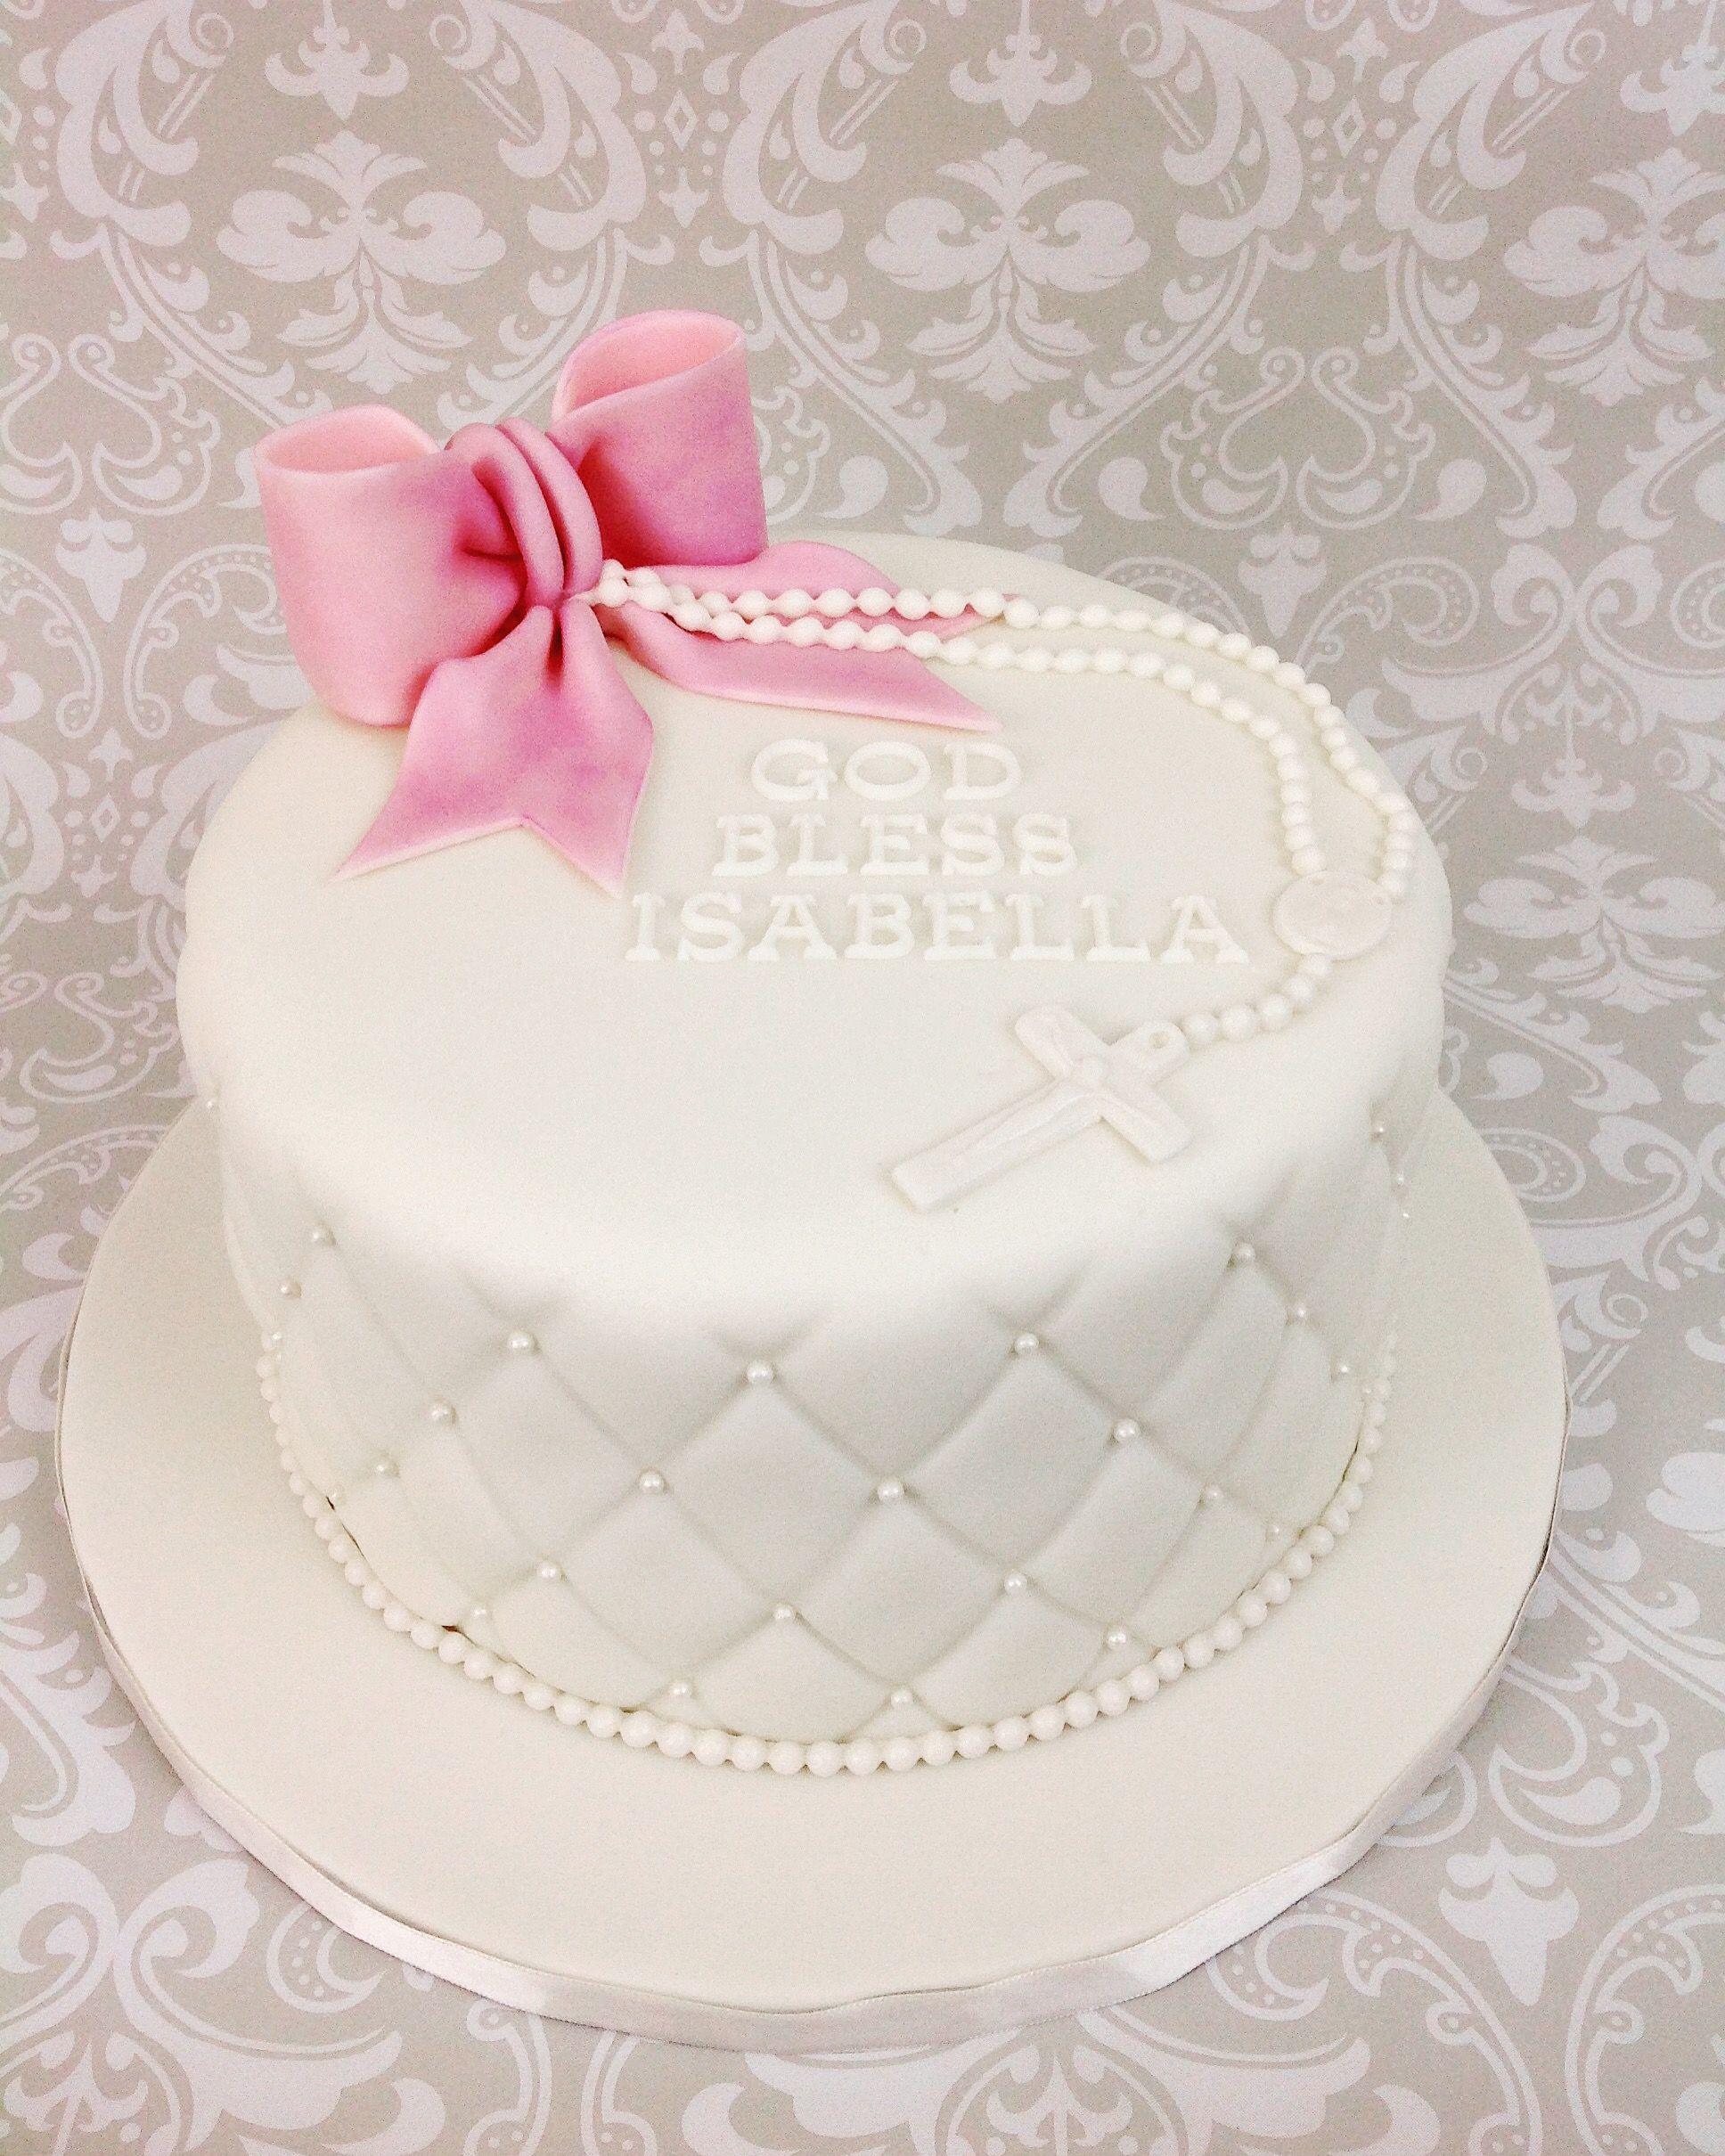 Baptism fondant cake Quilt cake .simplydulcekakes.com | Baby ... : quilted fondant - Adamdwight.com